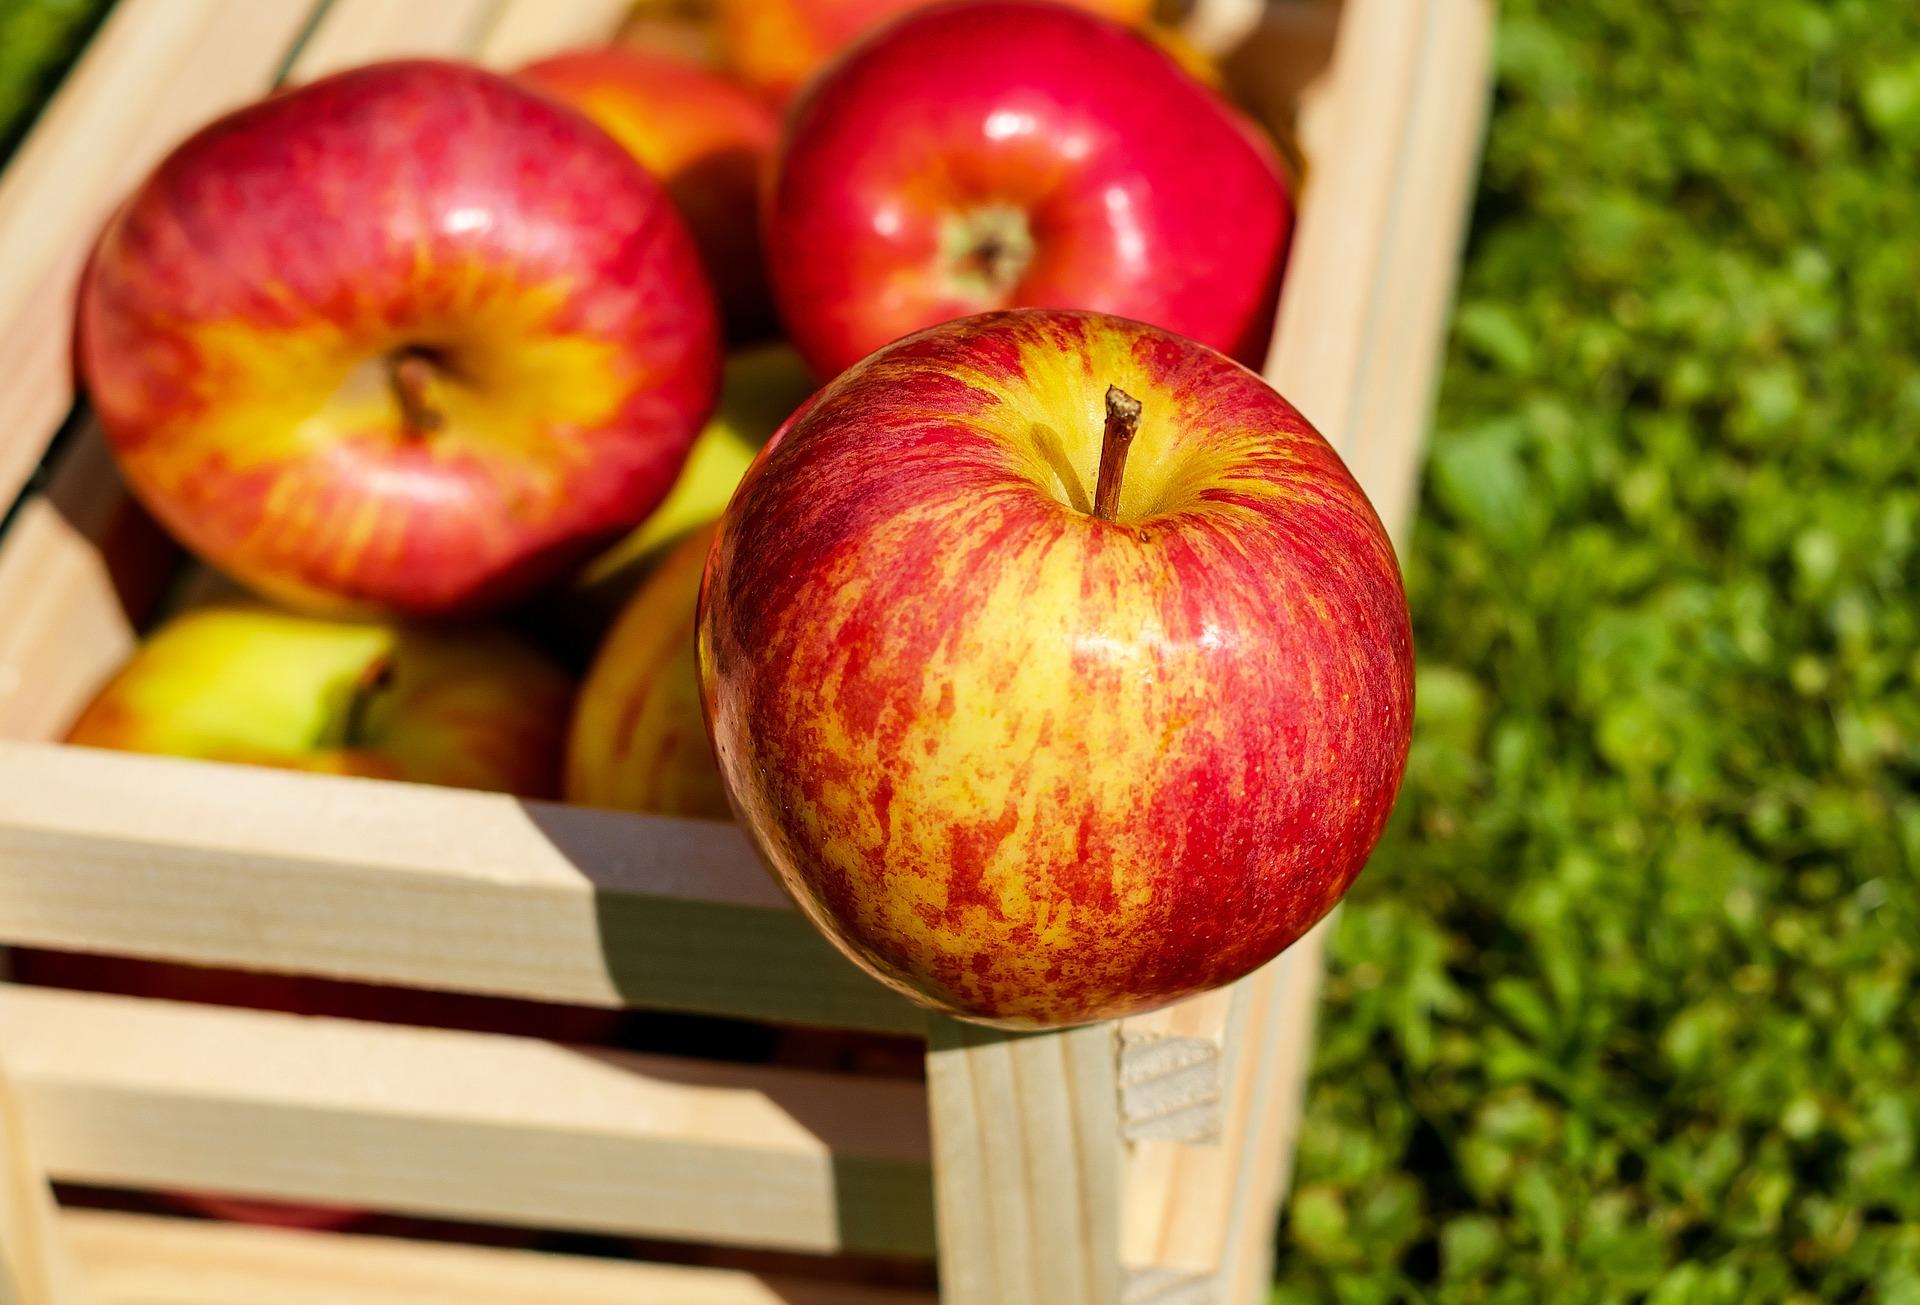 apple-1589874_1920.jpg